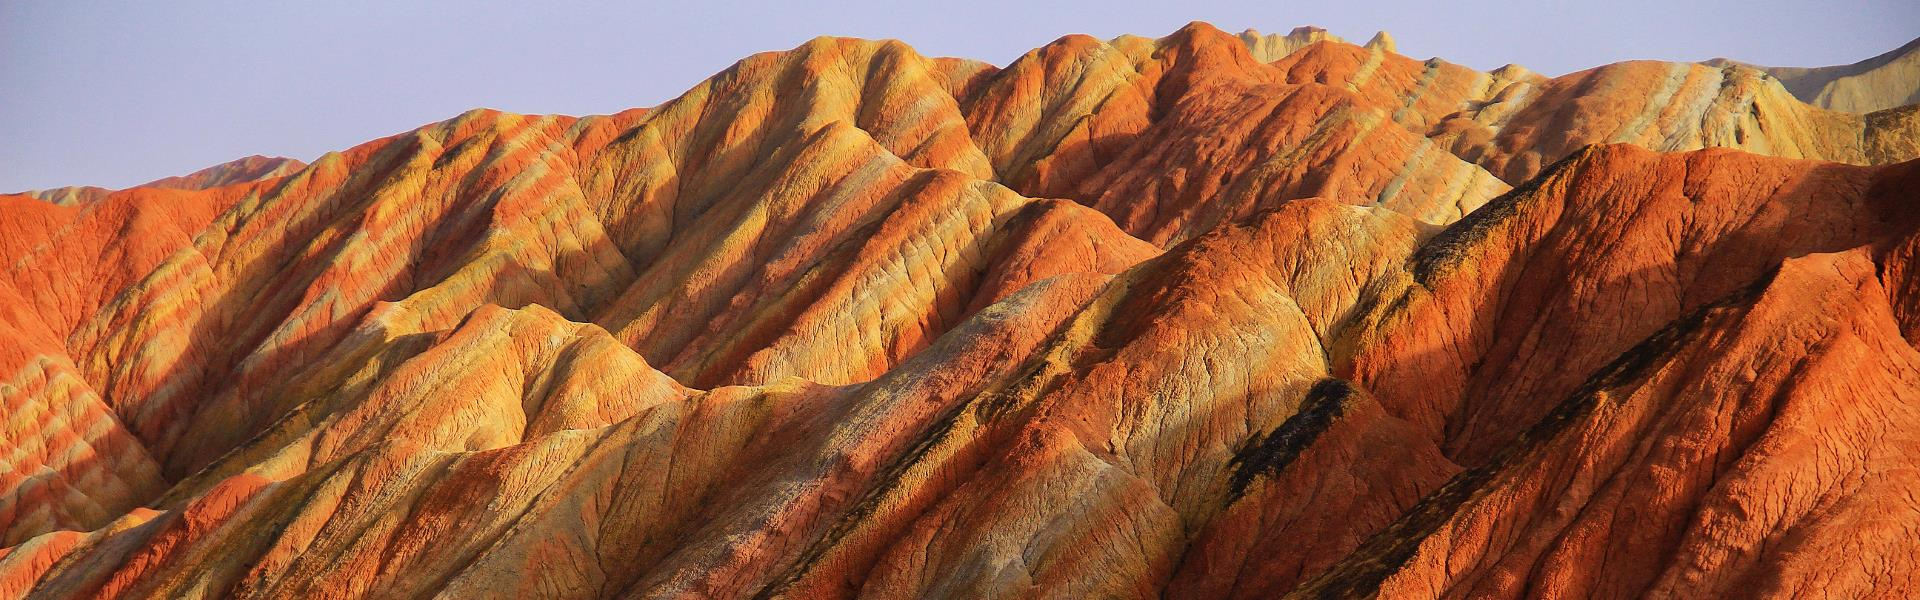 Zhangye Danxia Geopark, Gansu China